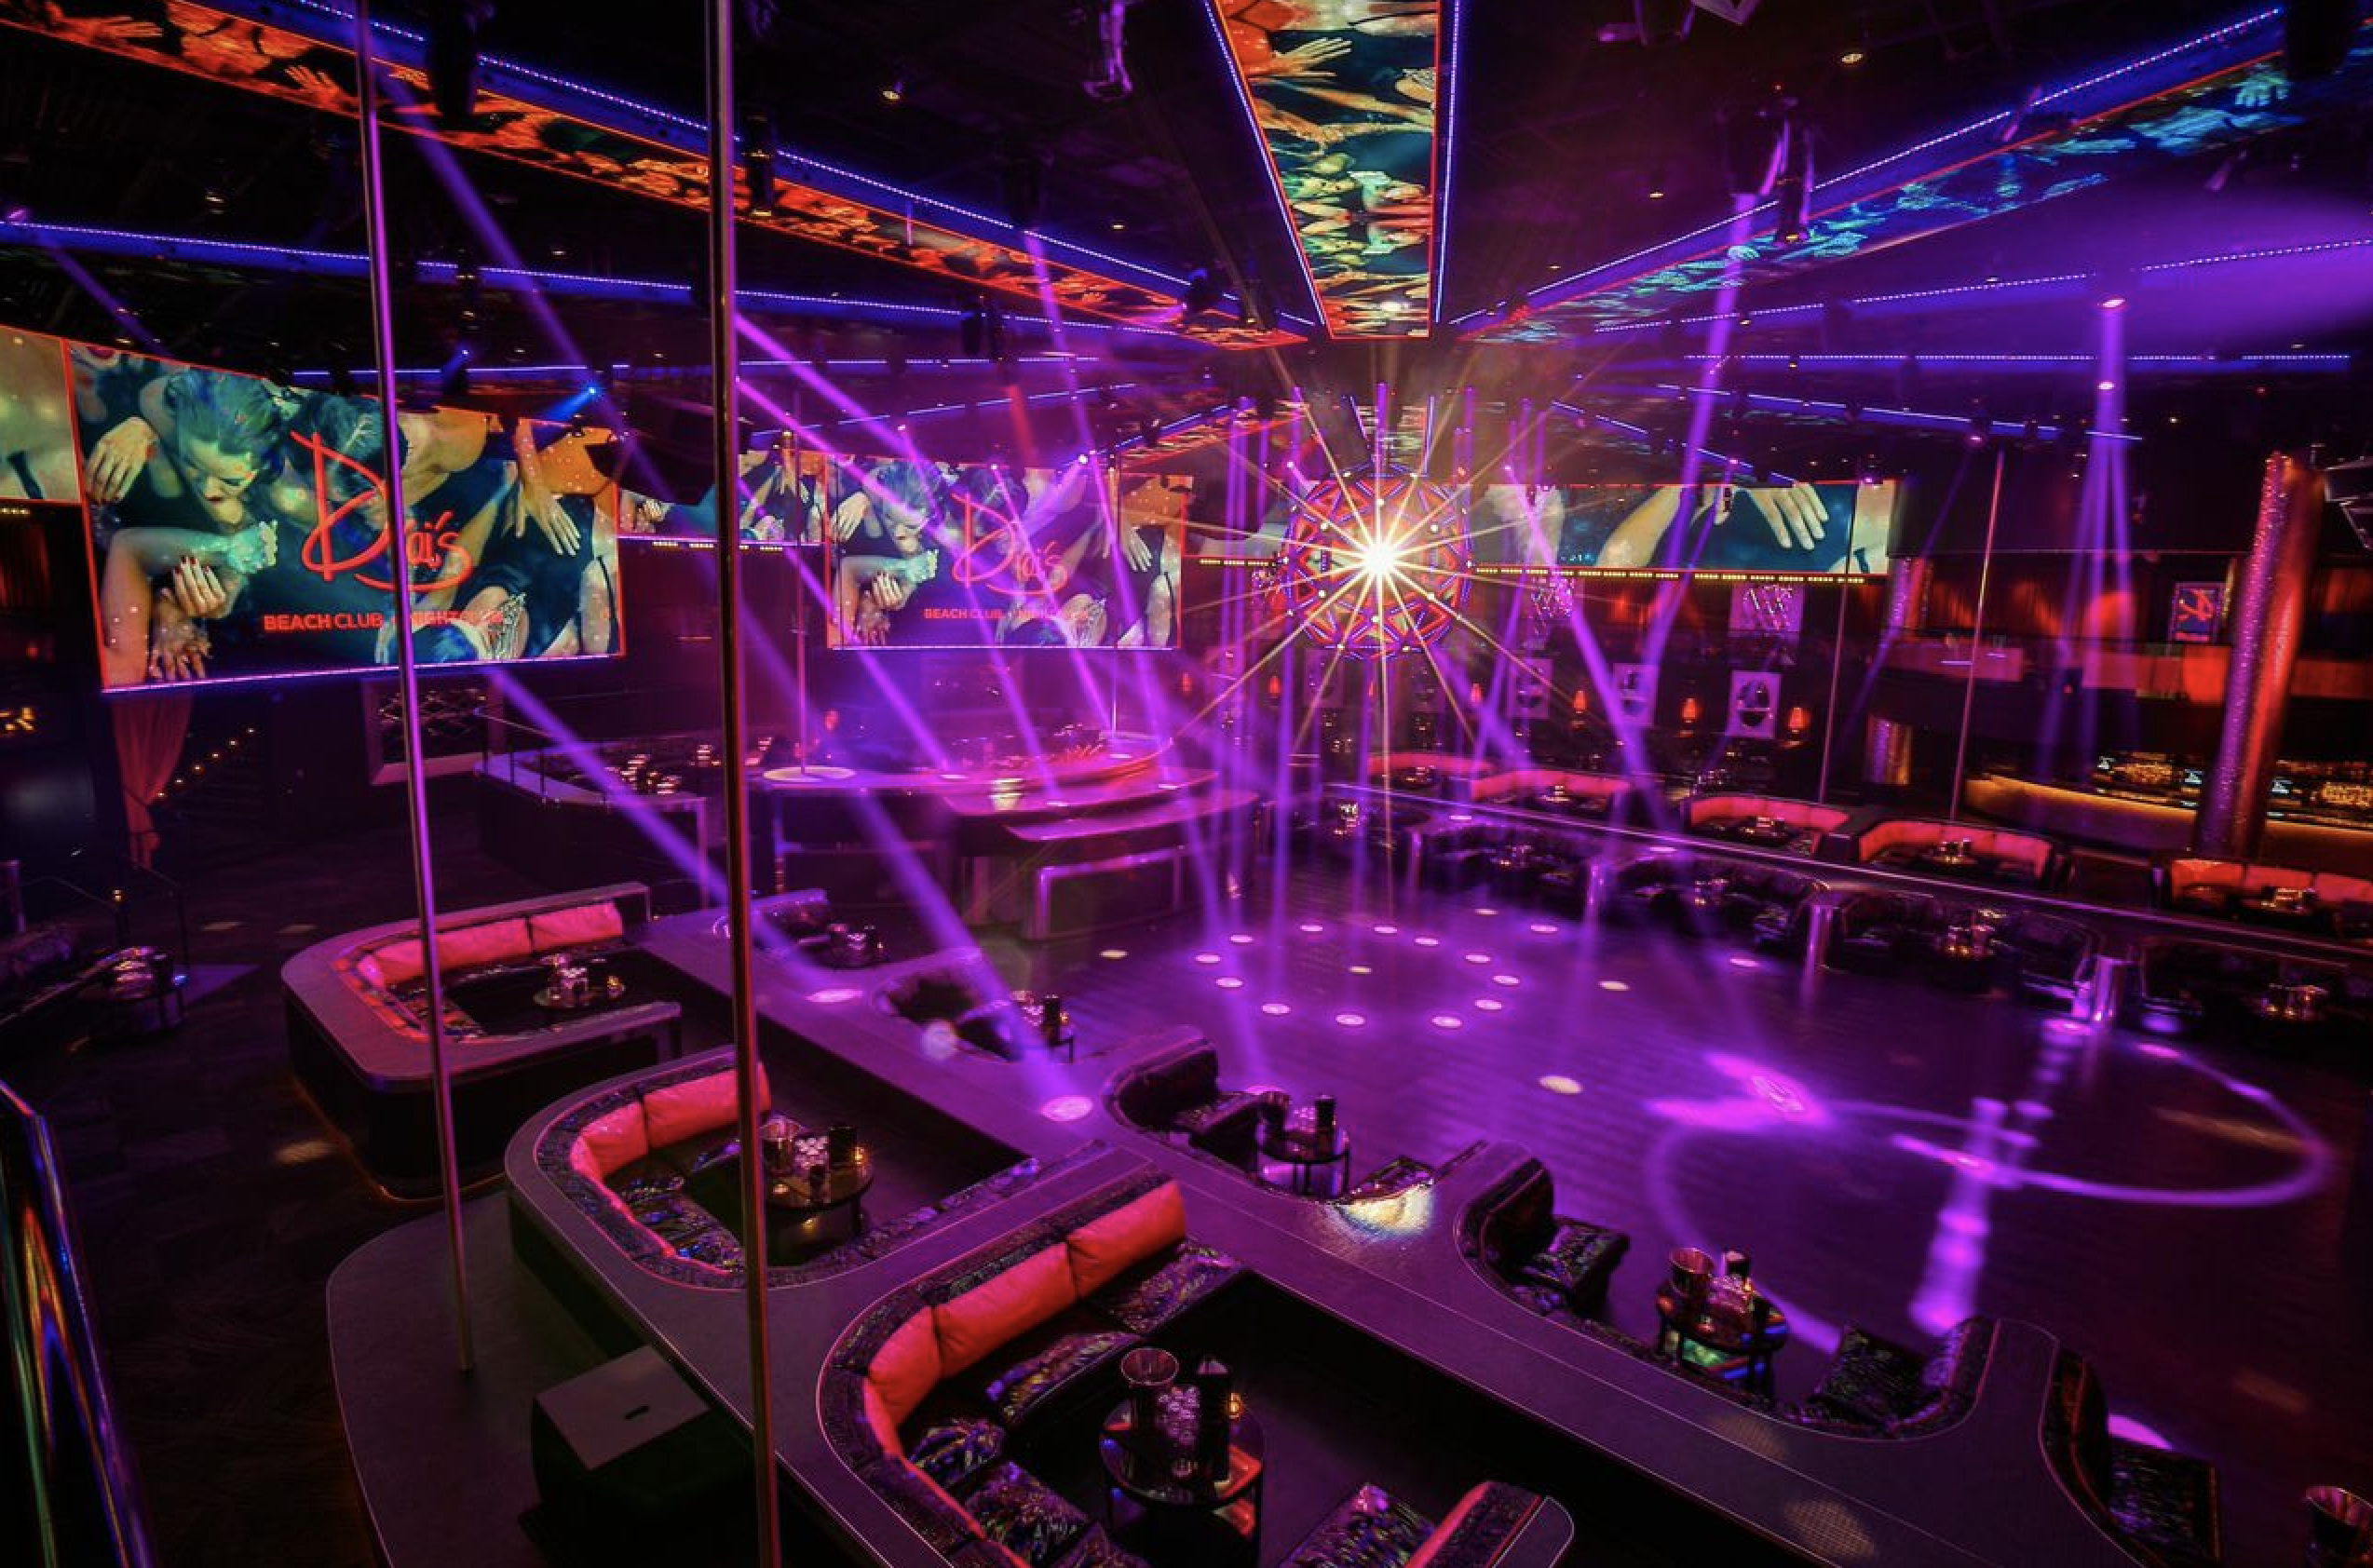 Drai's Nightclub Upper Dance Floor Table